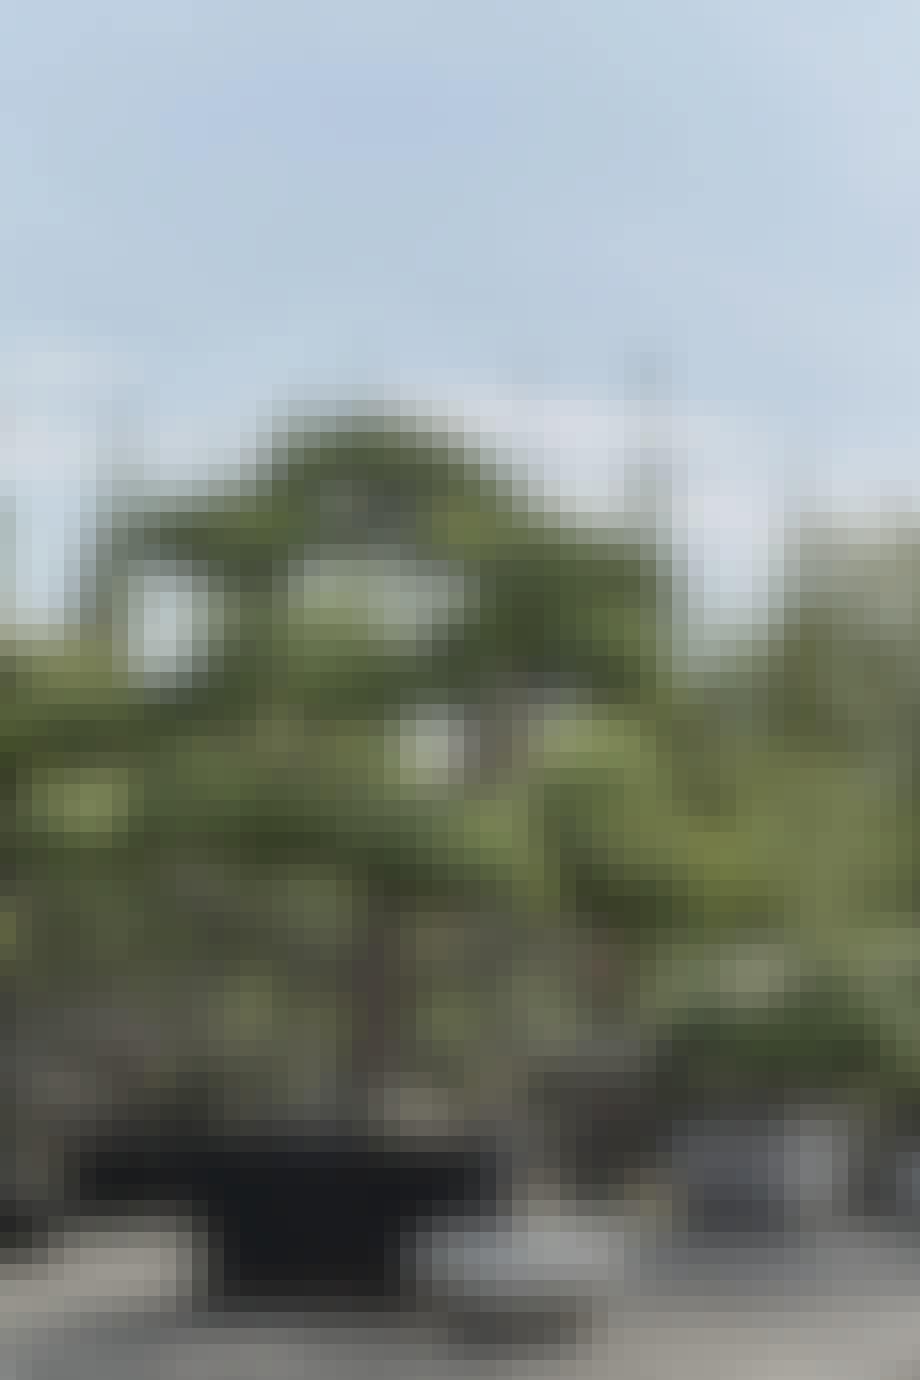 Bonsaiklippede kirsebærkornel